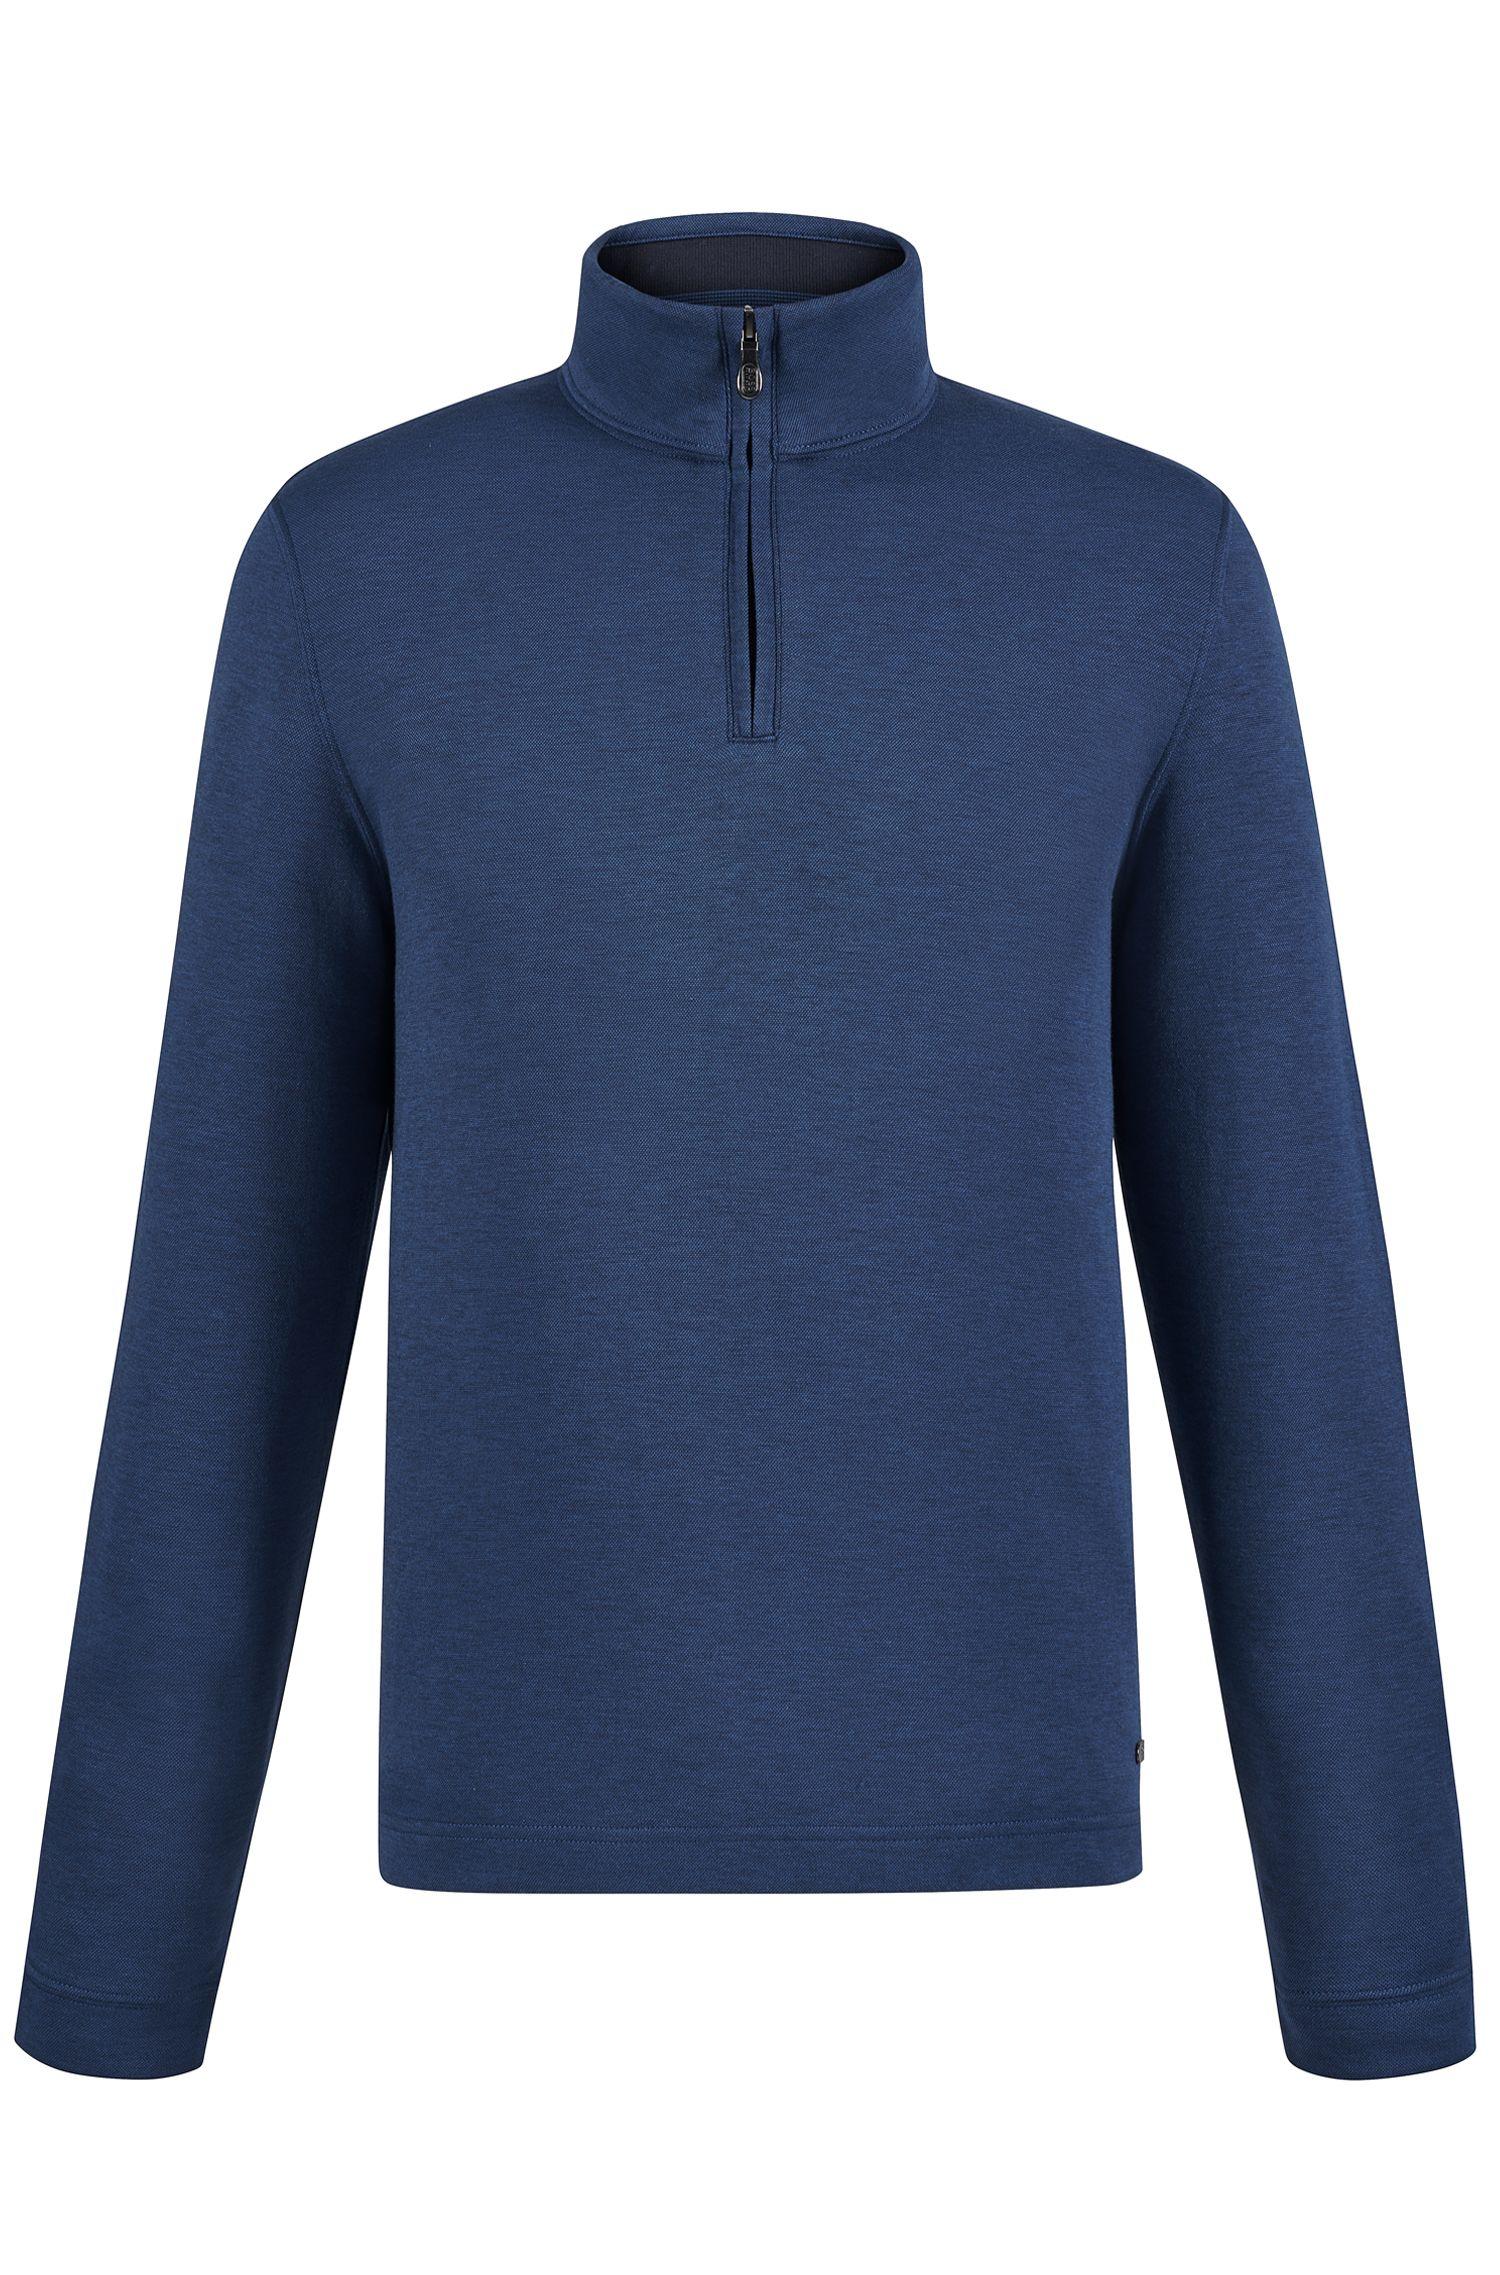 'C-Piceno' | Cotton Blend Troyer Shirt